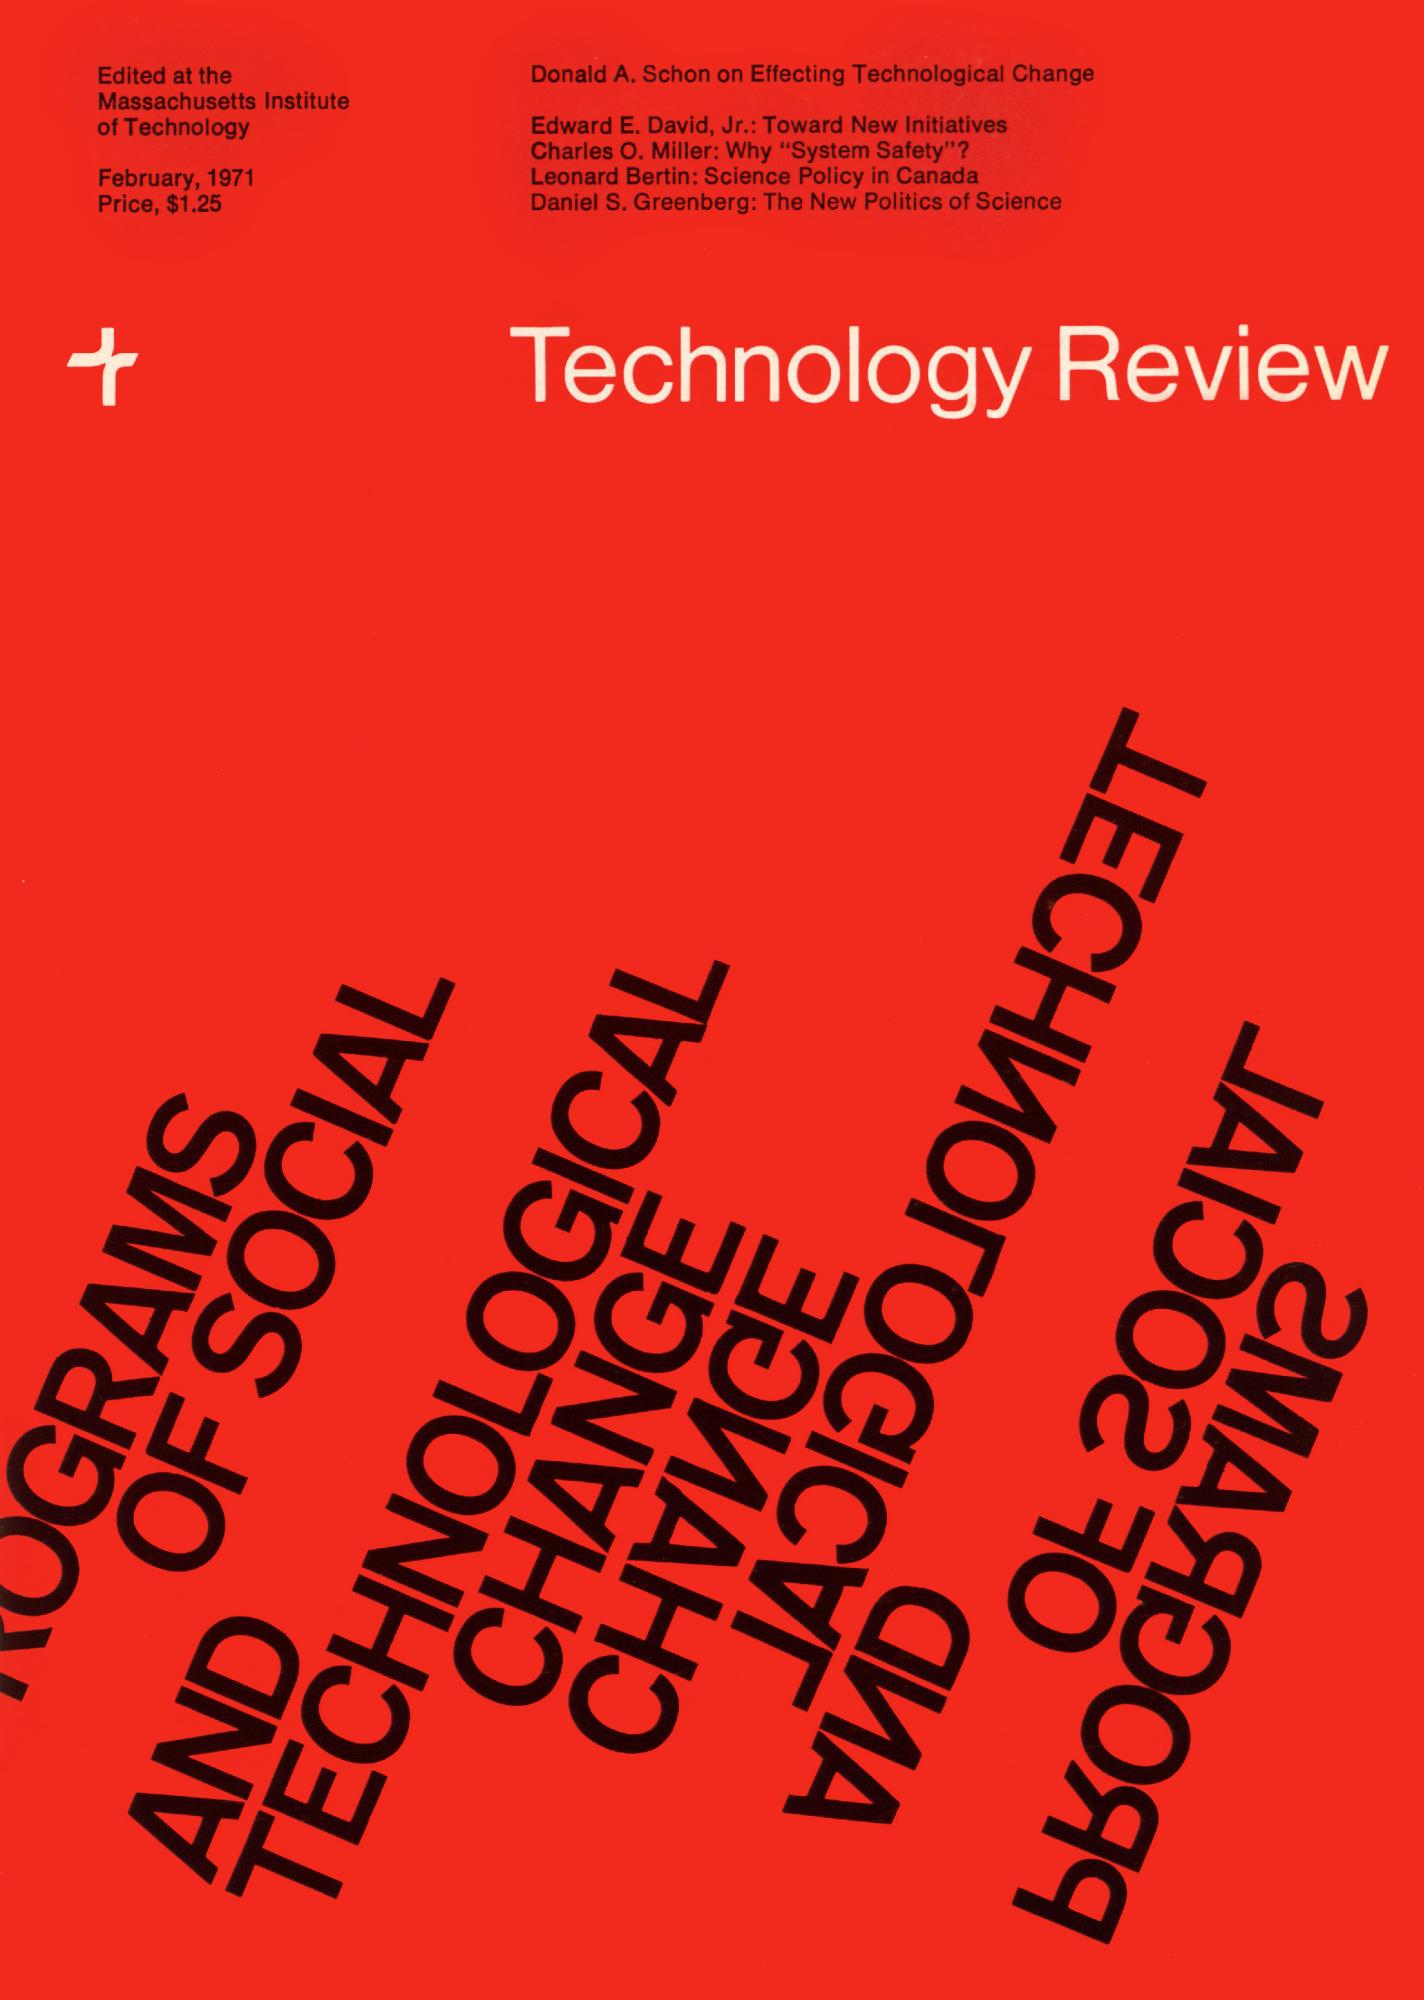 Feb 1971 cover